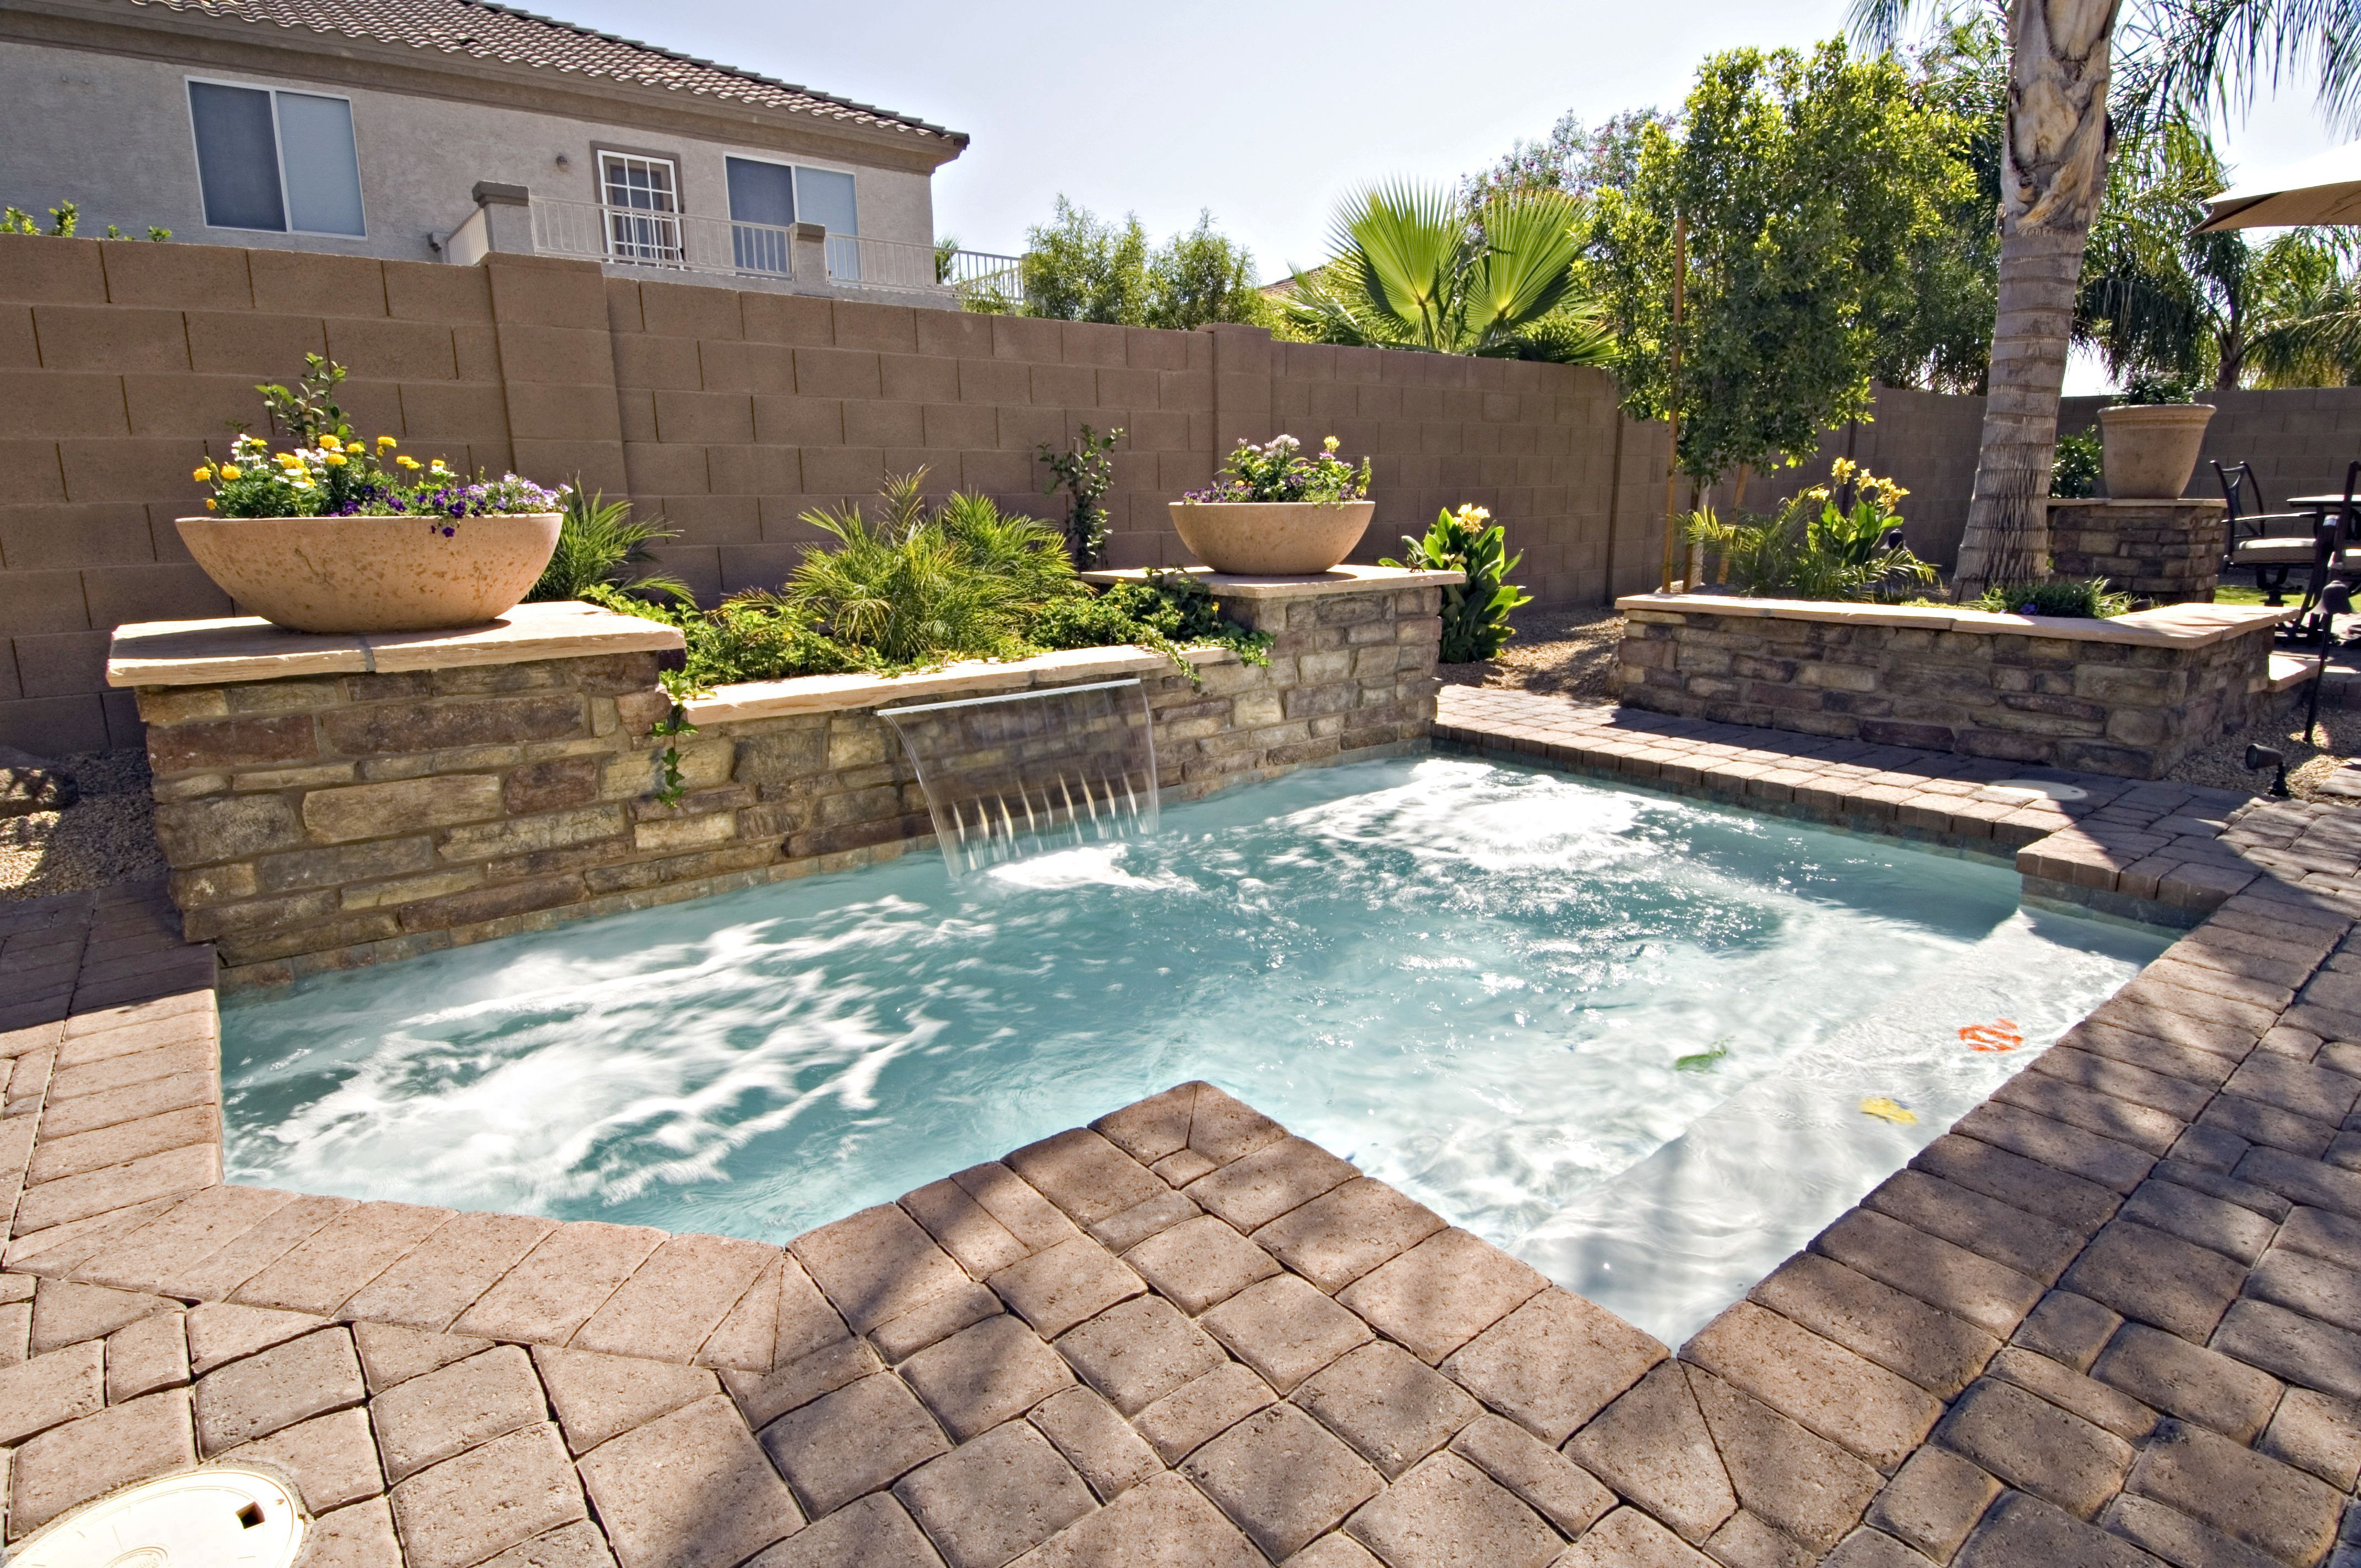 Backyard Pool Designs For Small Yards Nice Yard In Inspiration